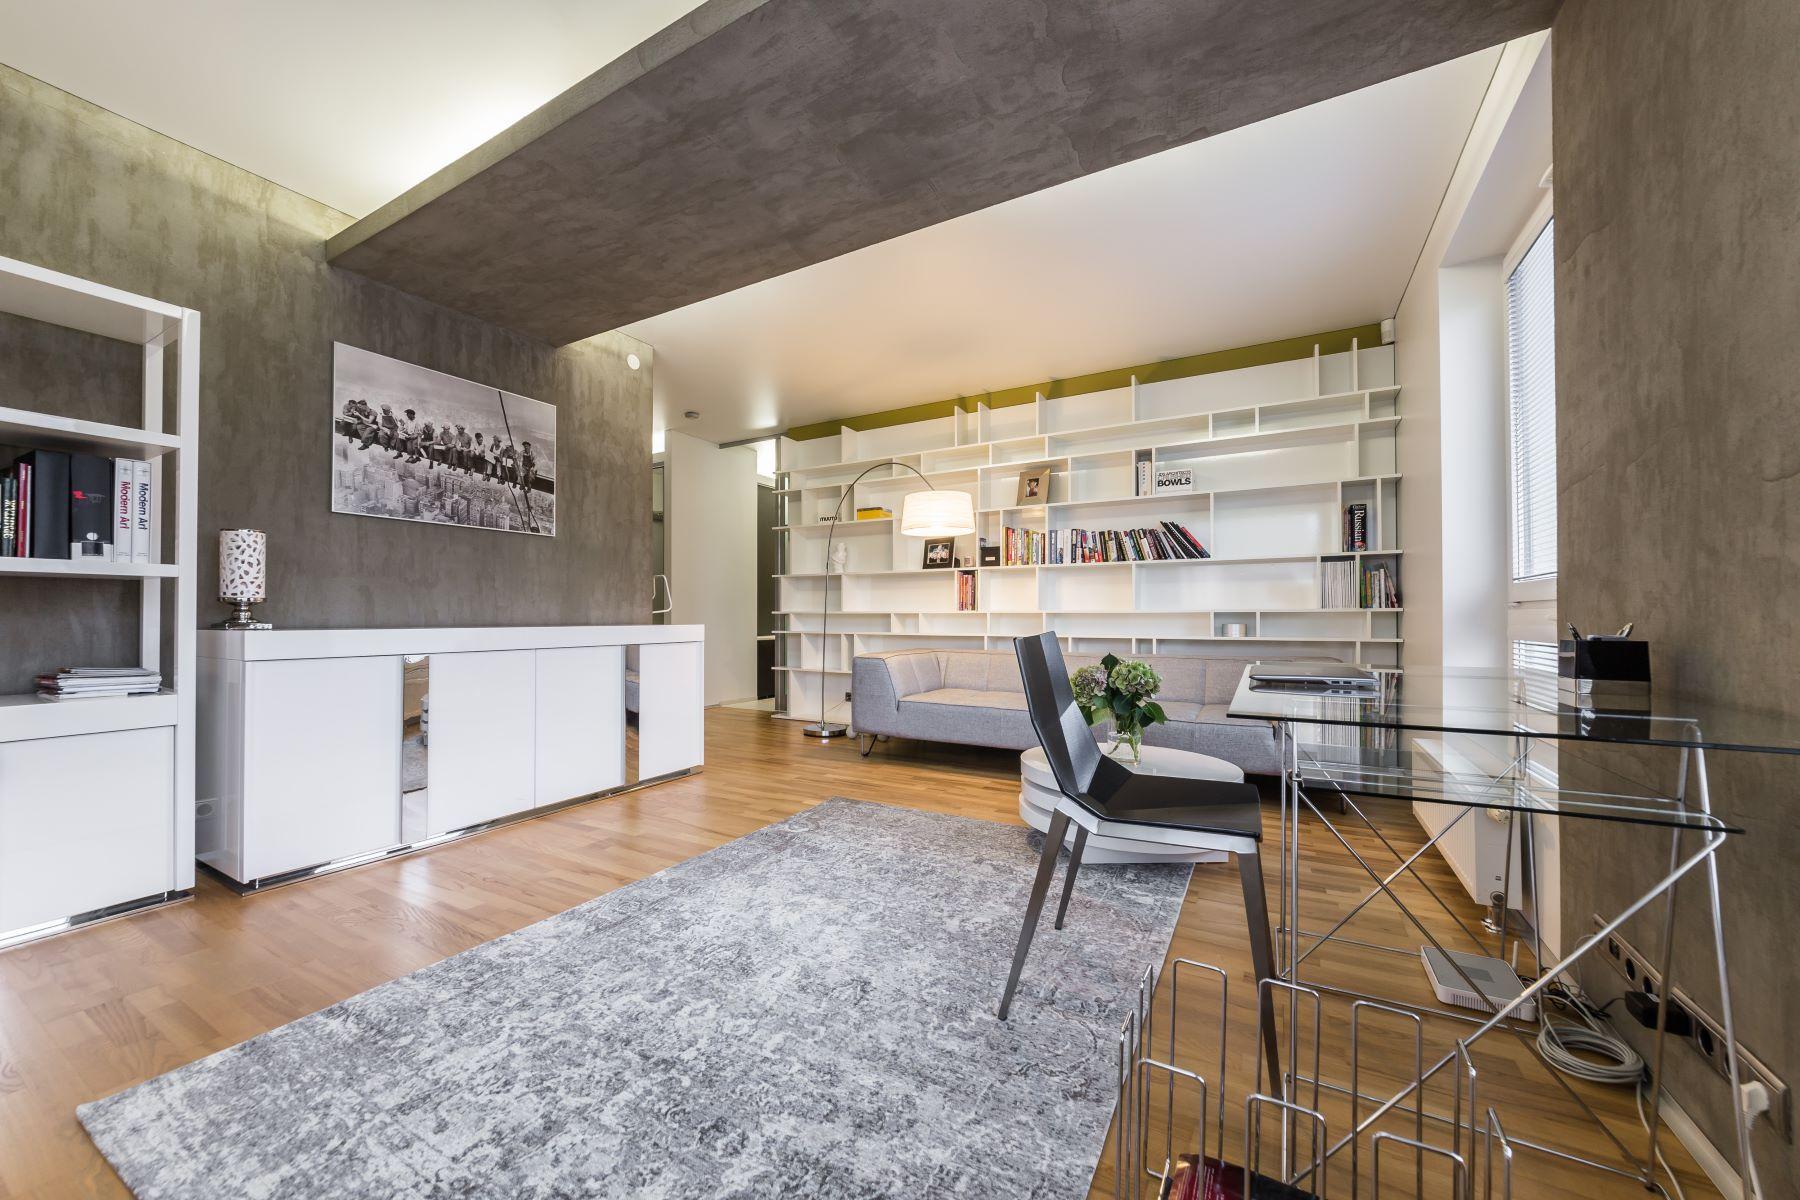 Apartment for Sale at Fully-furnished 1-bedroom apartment in prestigious Pirita area Vahtriku tee 1 Pirita Tallinn, Harjumaa, 11912 Estonia